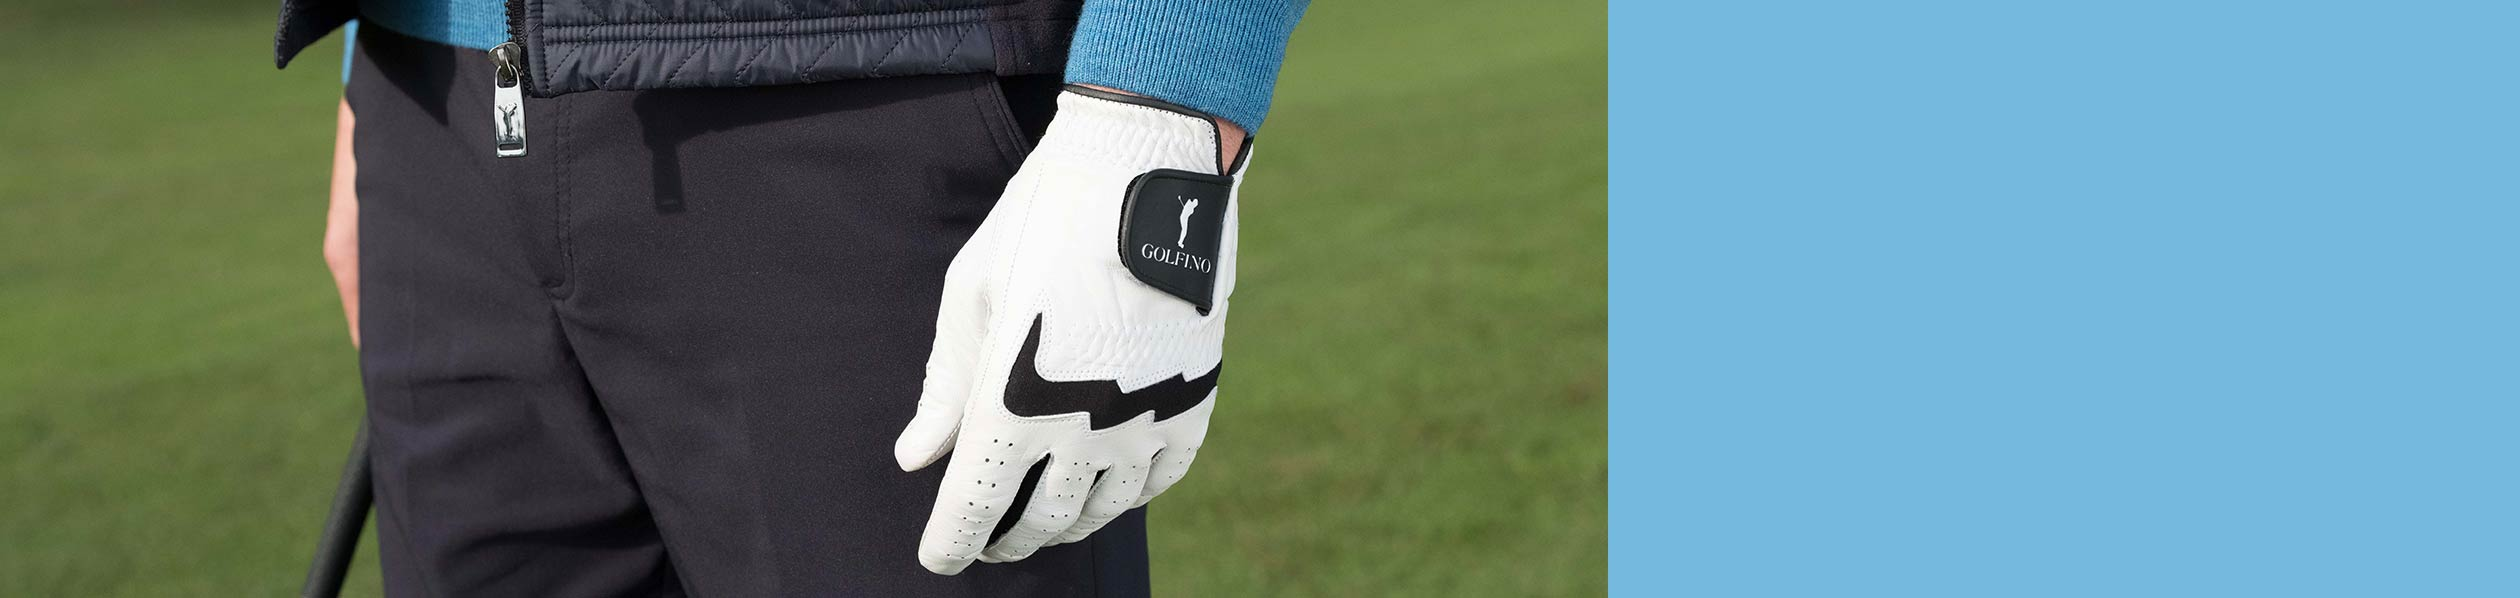 Herren-accessoires-golfh...